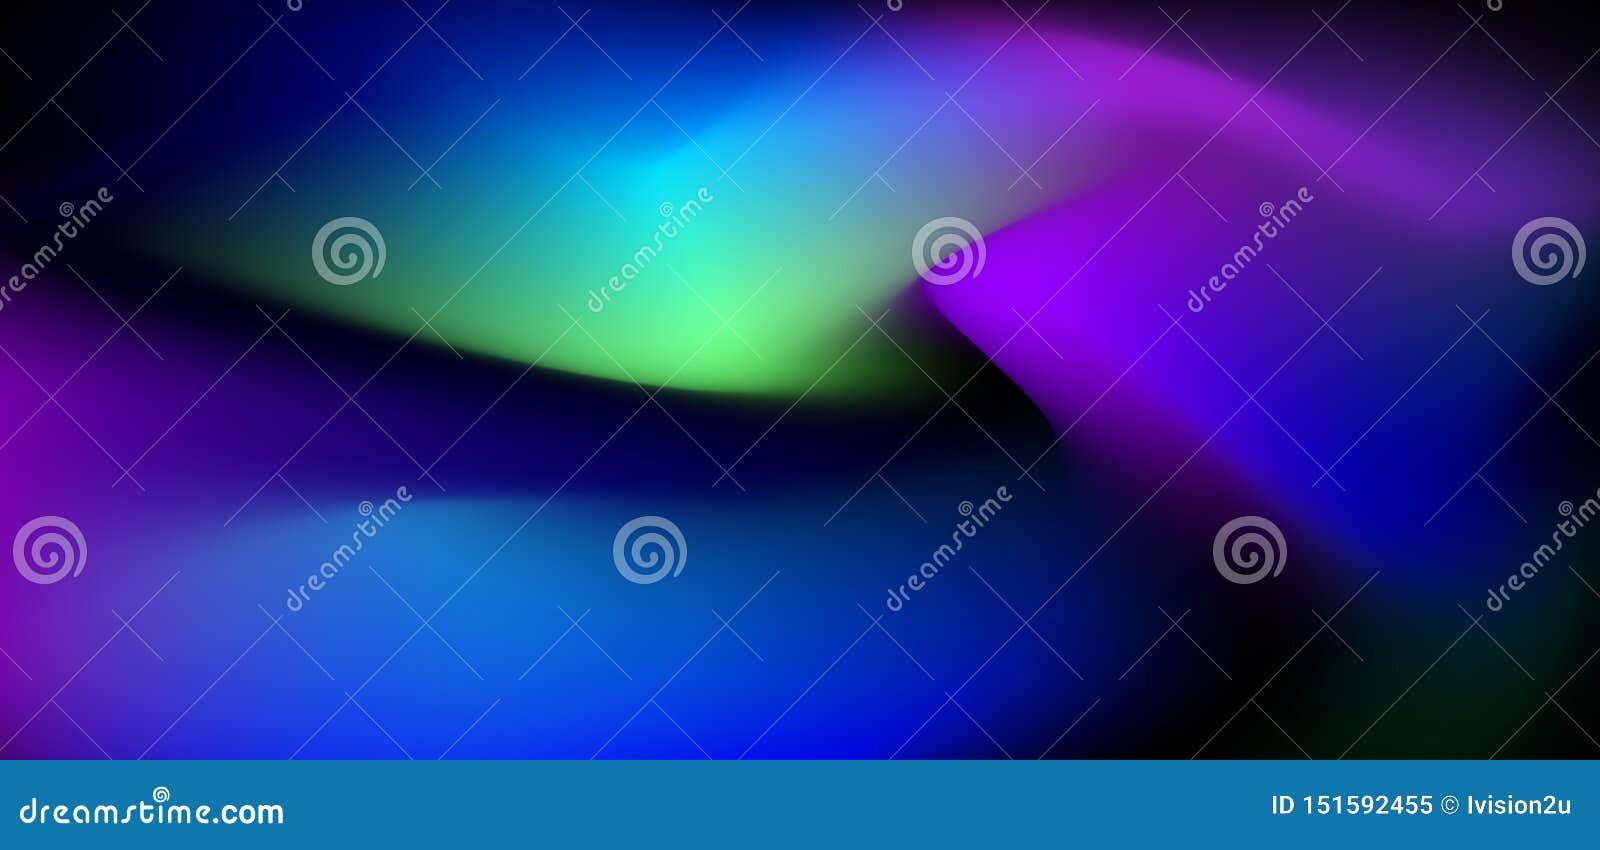 Illustration abstract glowing, neon light, minimal bright fluid, liquid gradient background. Vector modern trendy, graphic design